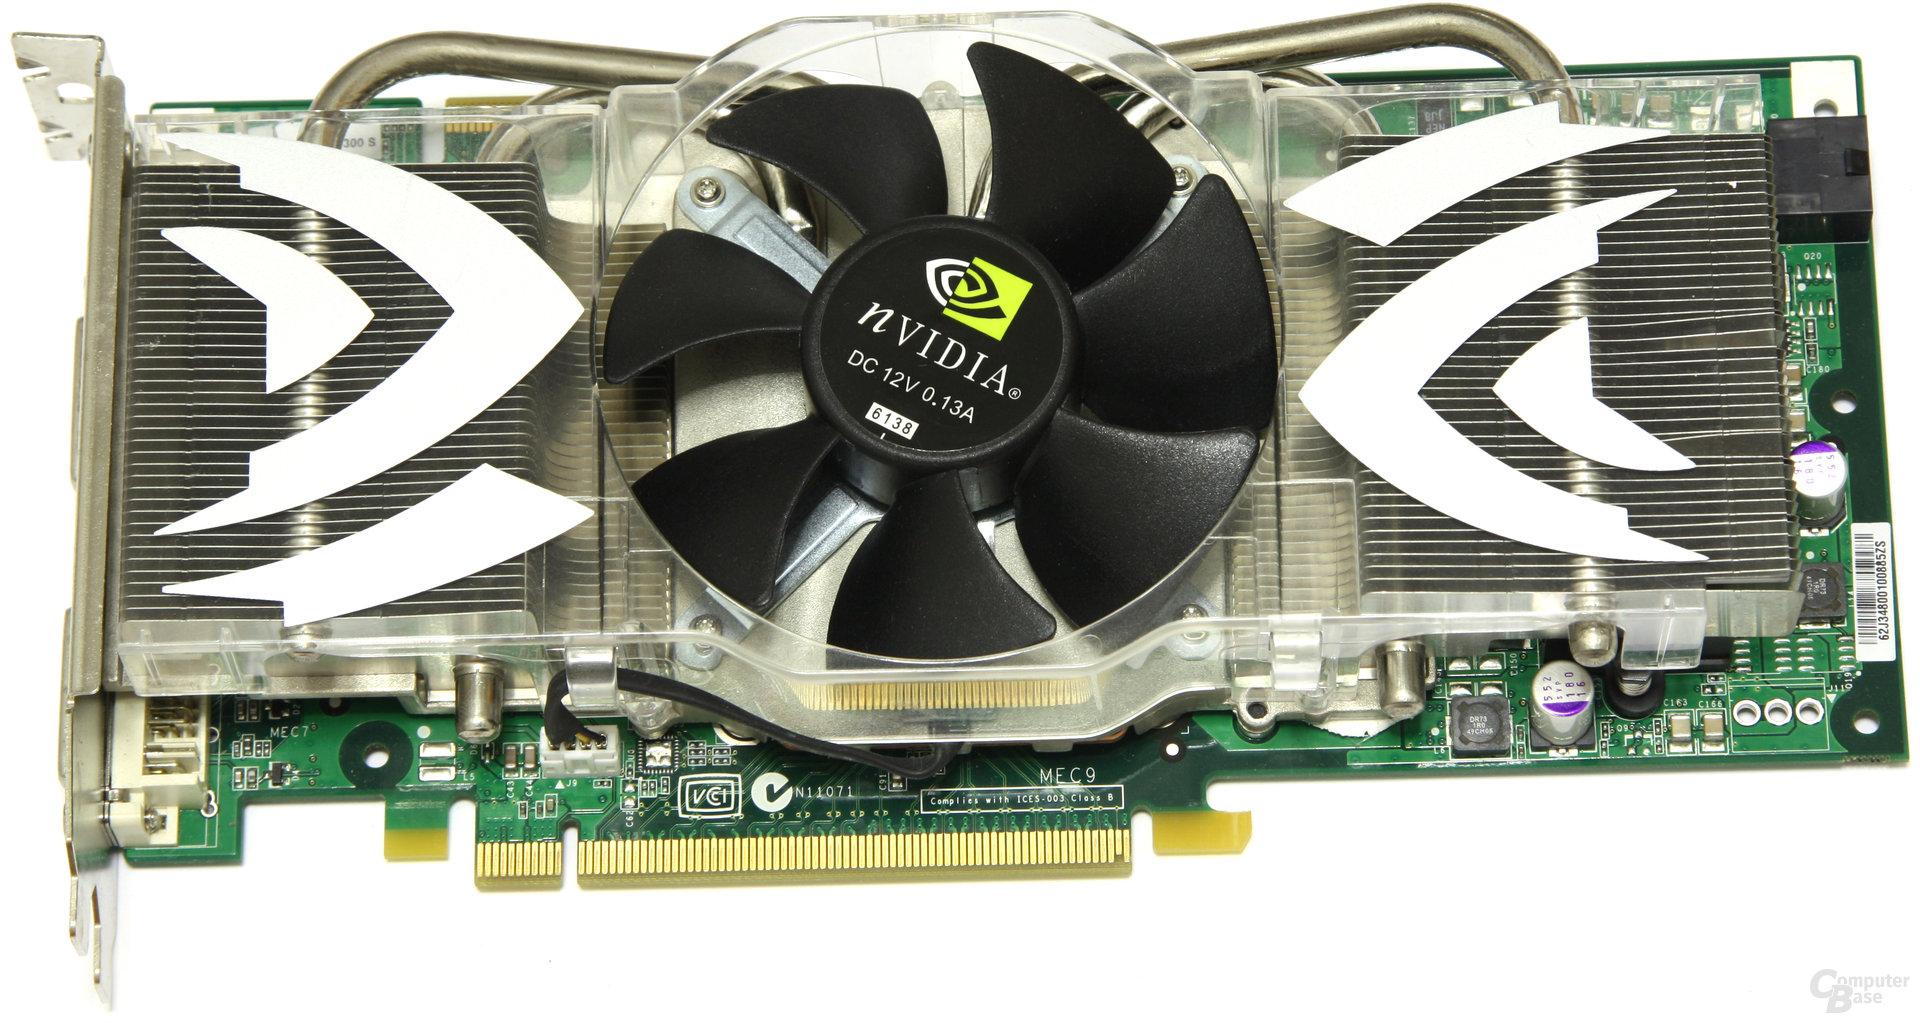 Nvidia GeForce 7900 GTX (2006)